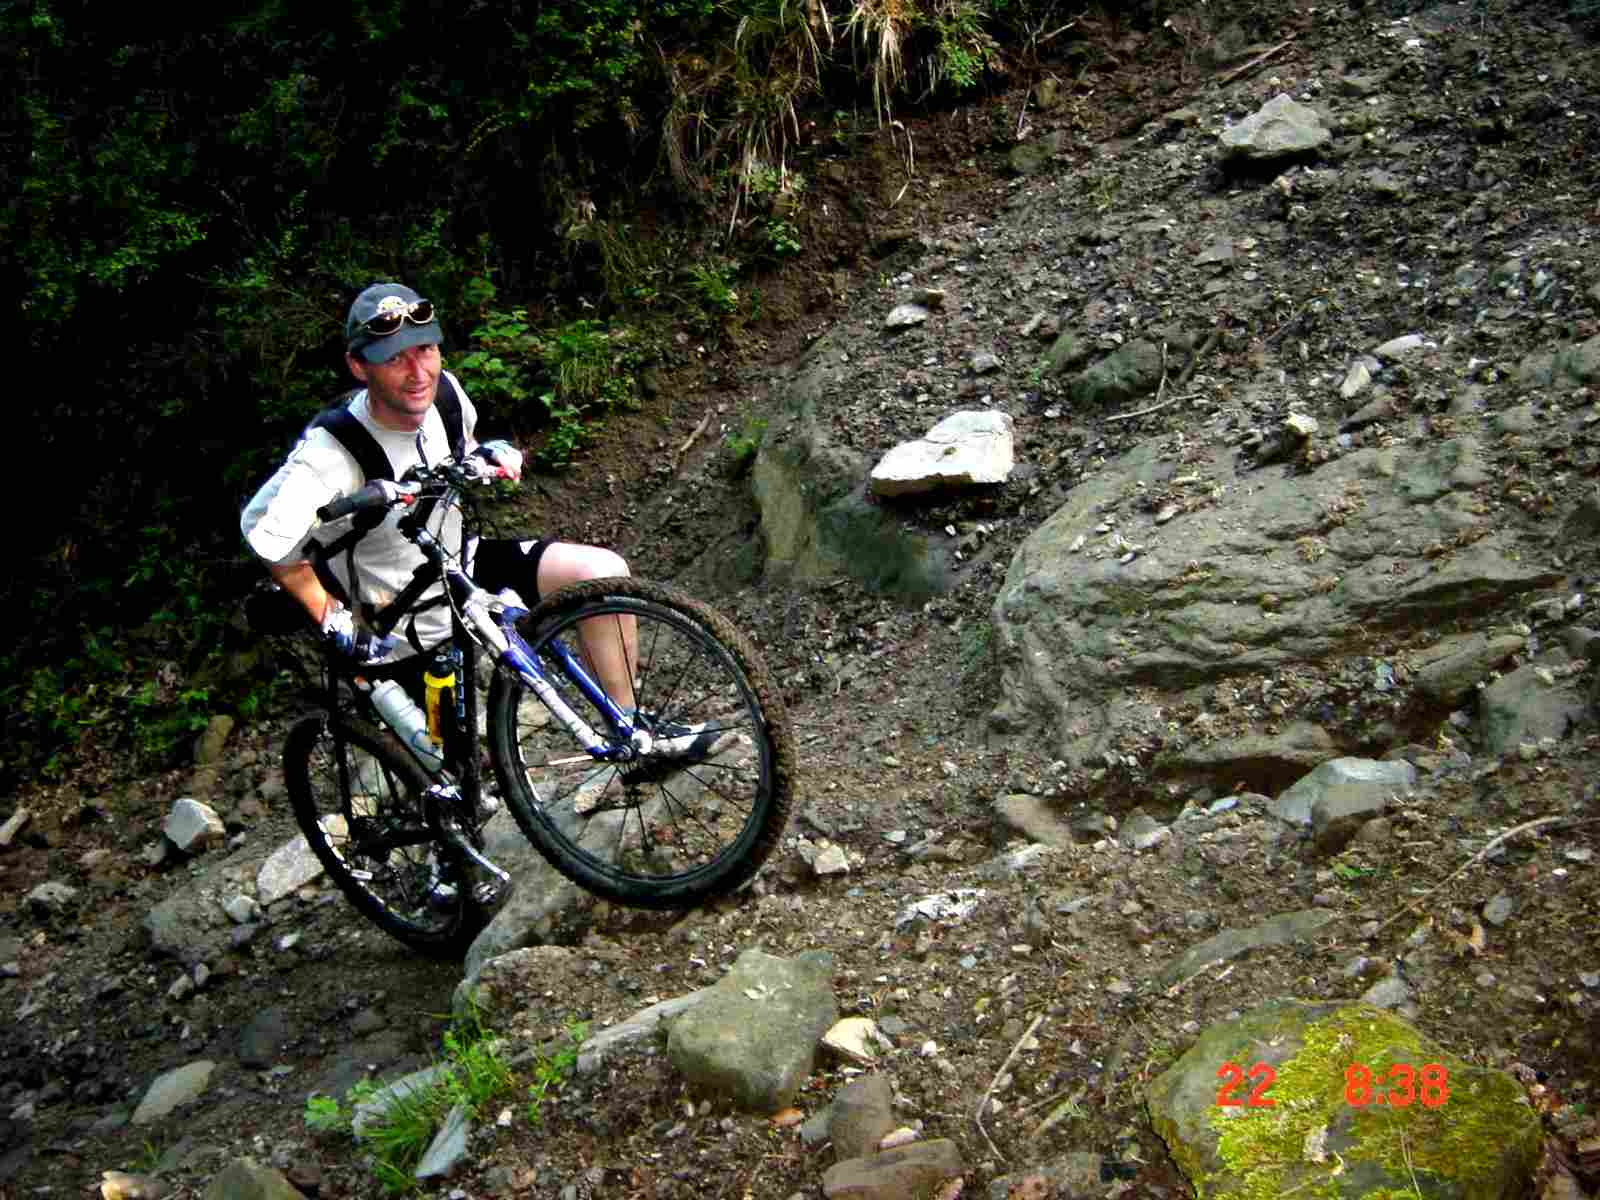 Foto: Manfred Karl / Mountainbike Tour / Monte Castel Giudeo, 1037 m / Letztes Steilstück / 20.06.2007 06:29:33